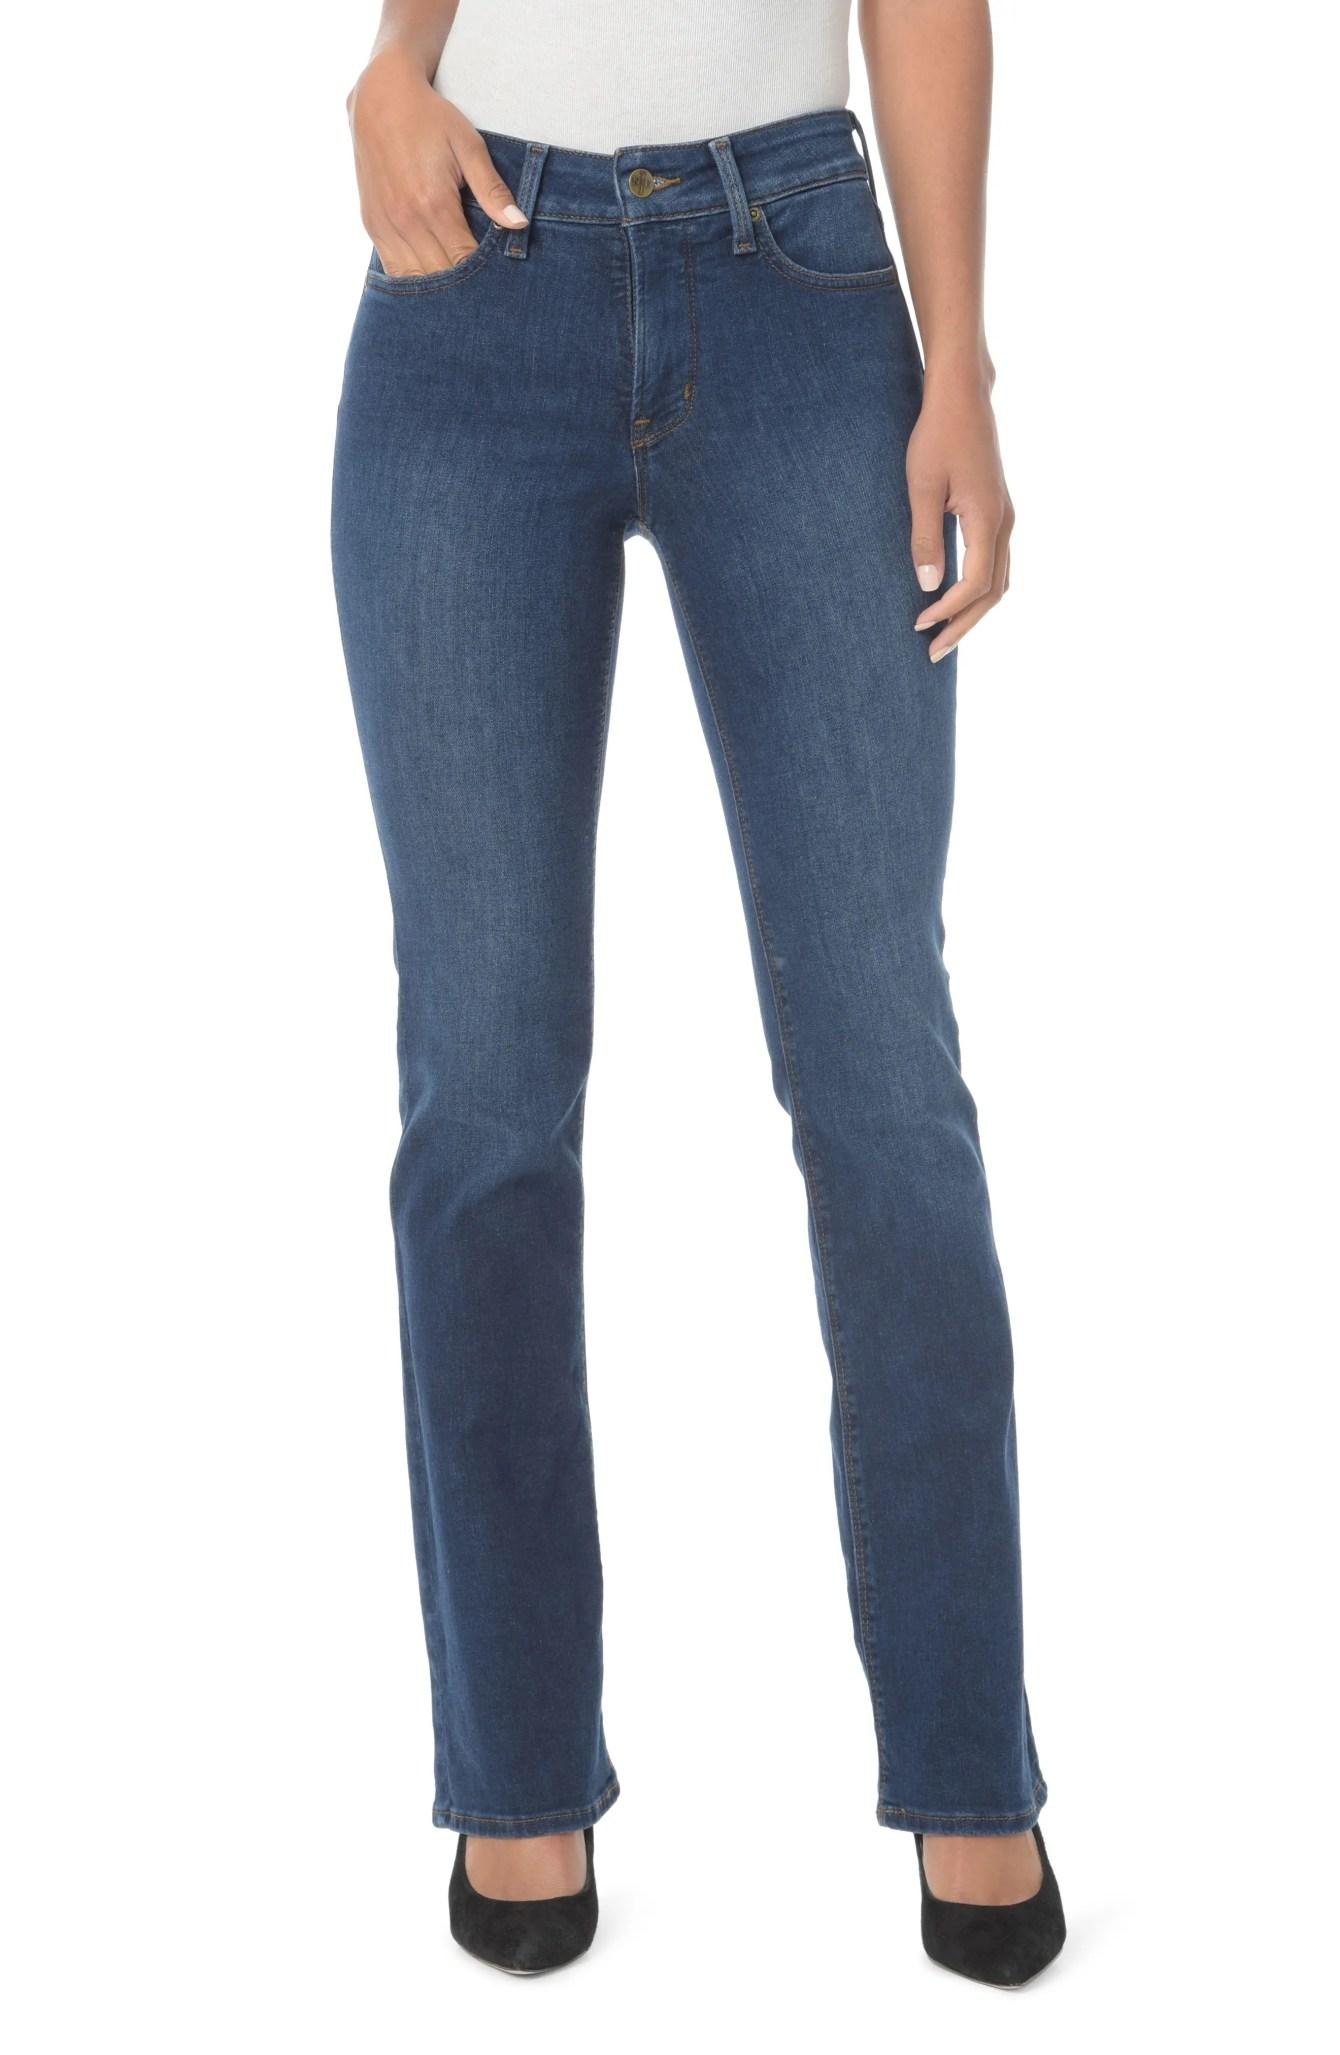 NYDJ Petite Barbara High Waist Stretch Bootcut Jeans (Nordstrom) $109